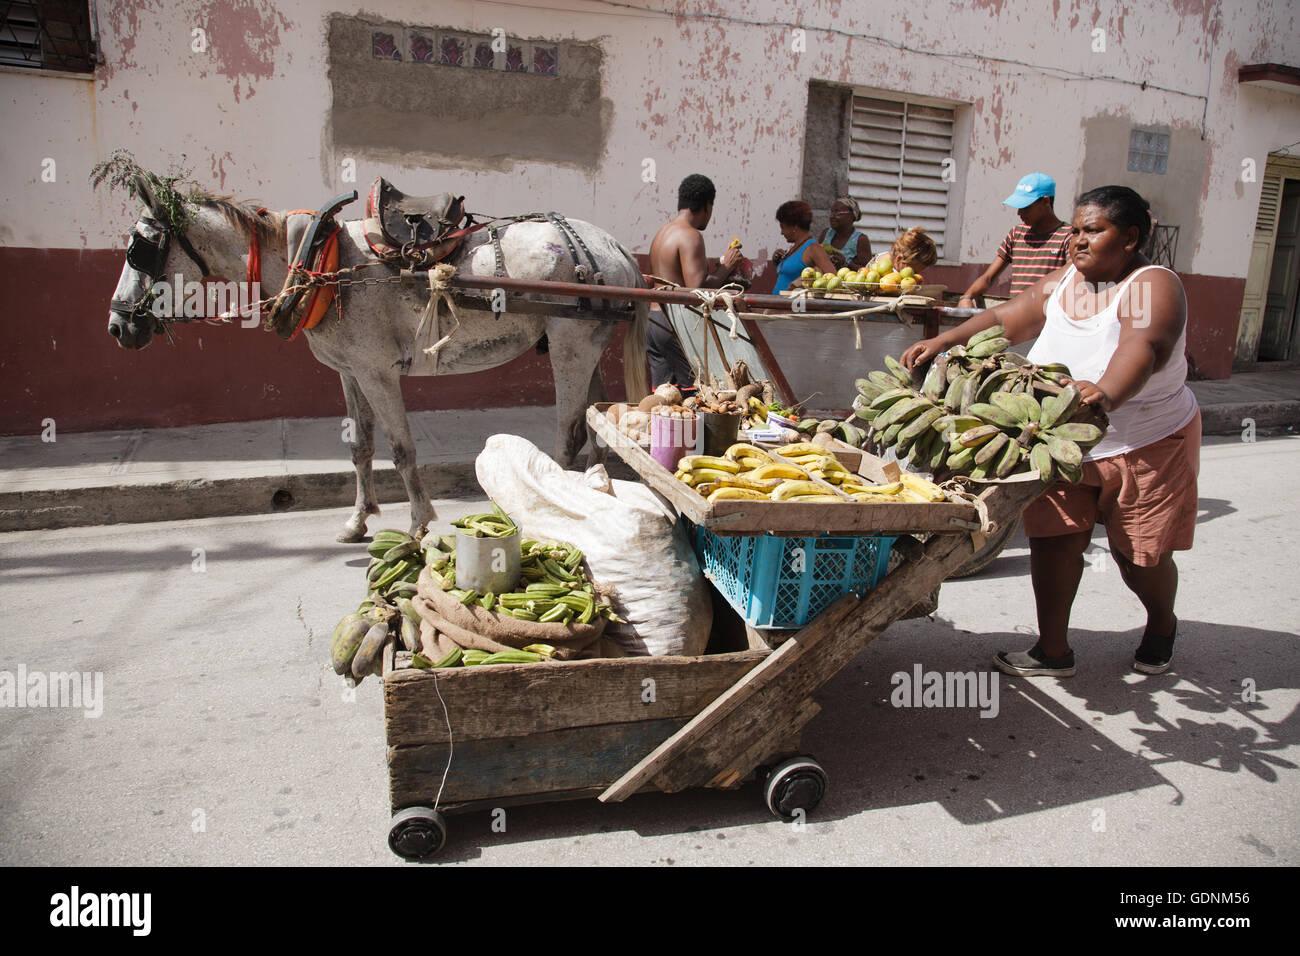 Image result for vendedor en santiago de Cuba con caballo